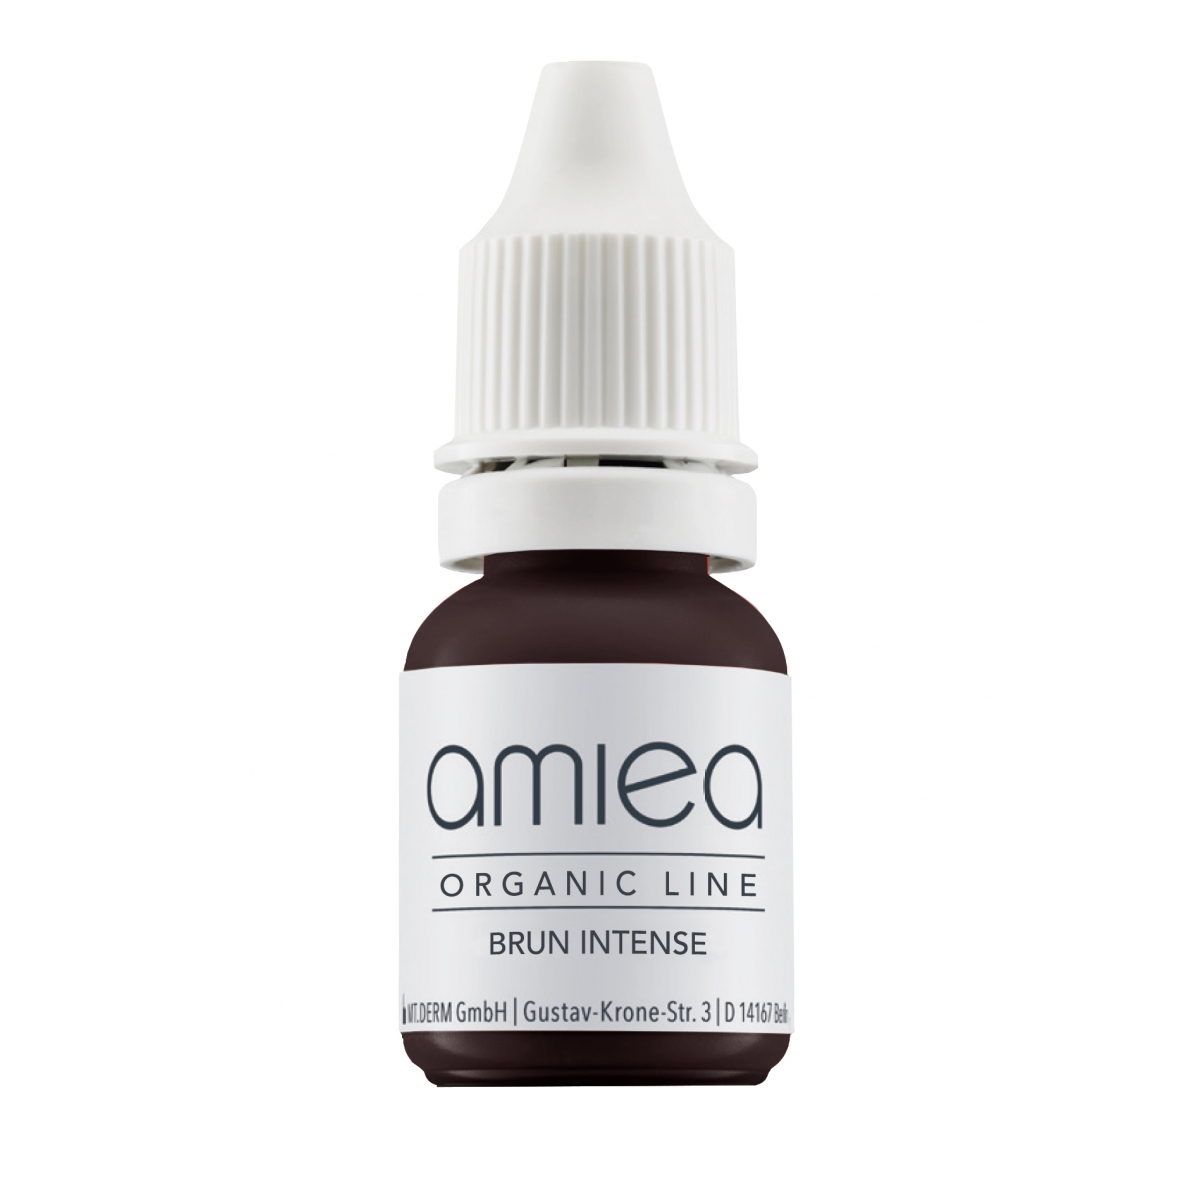 Organicline (10 ml) - PIGMENTS AMIEA ORGANICLINE BRUN INTENSE, Flacon 10 ml